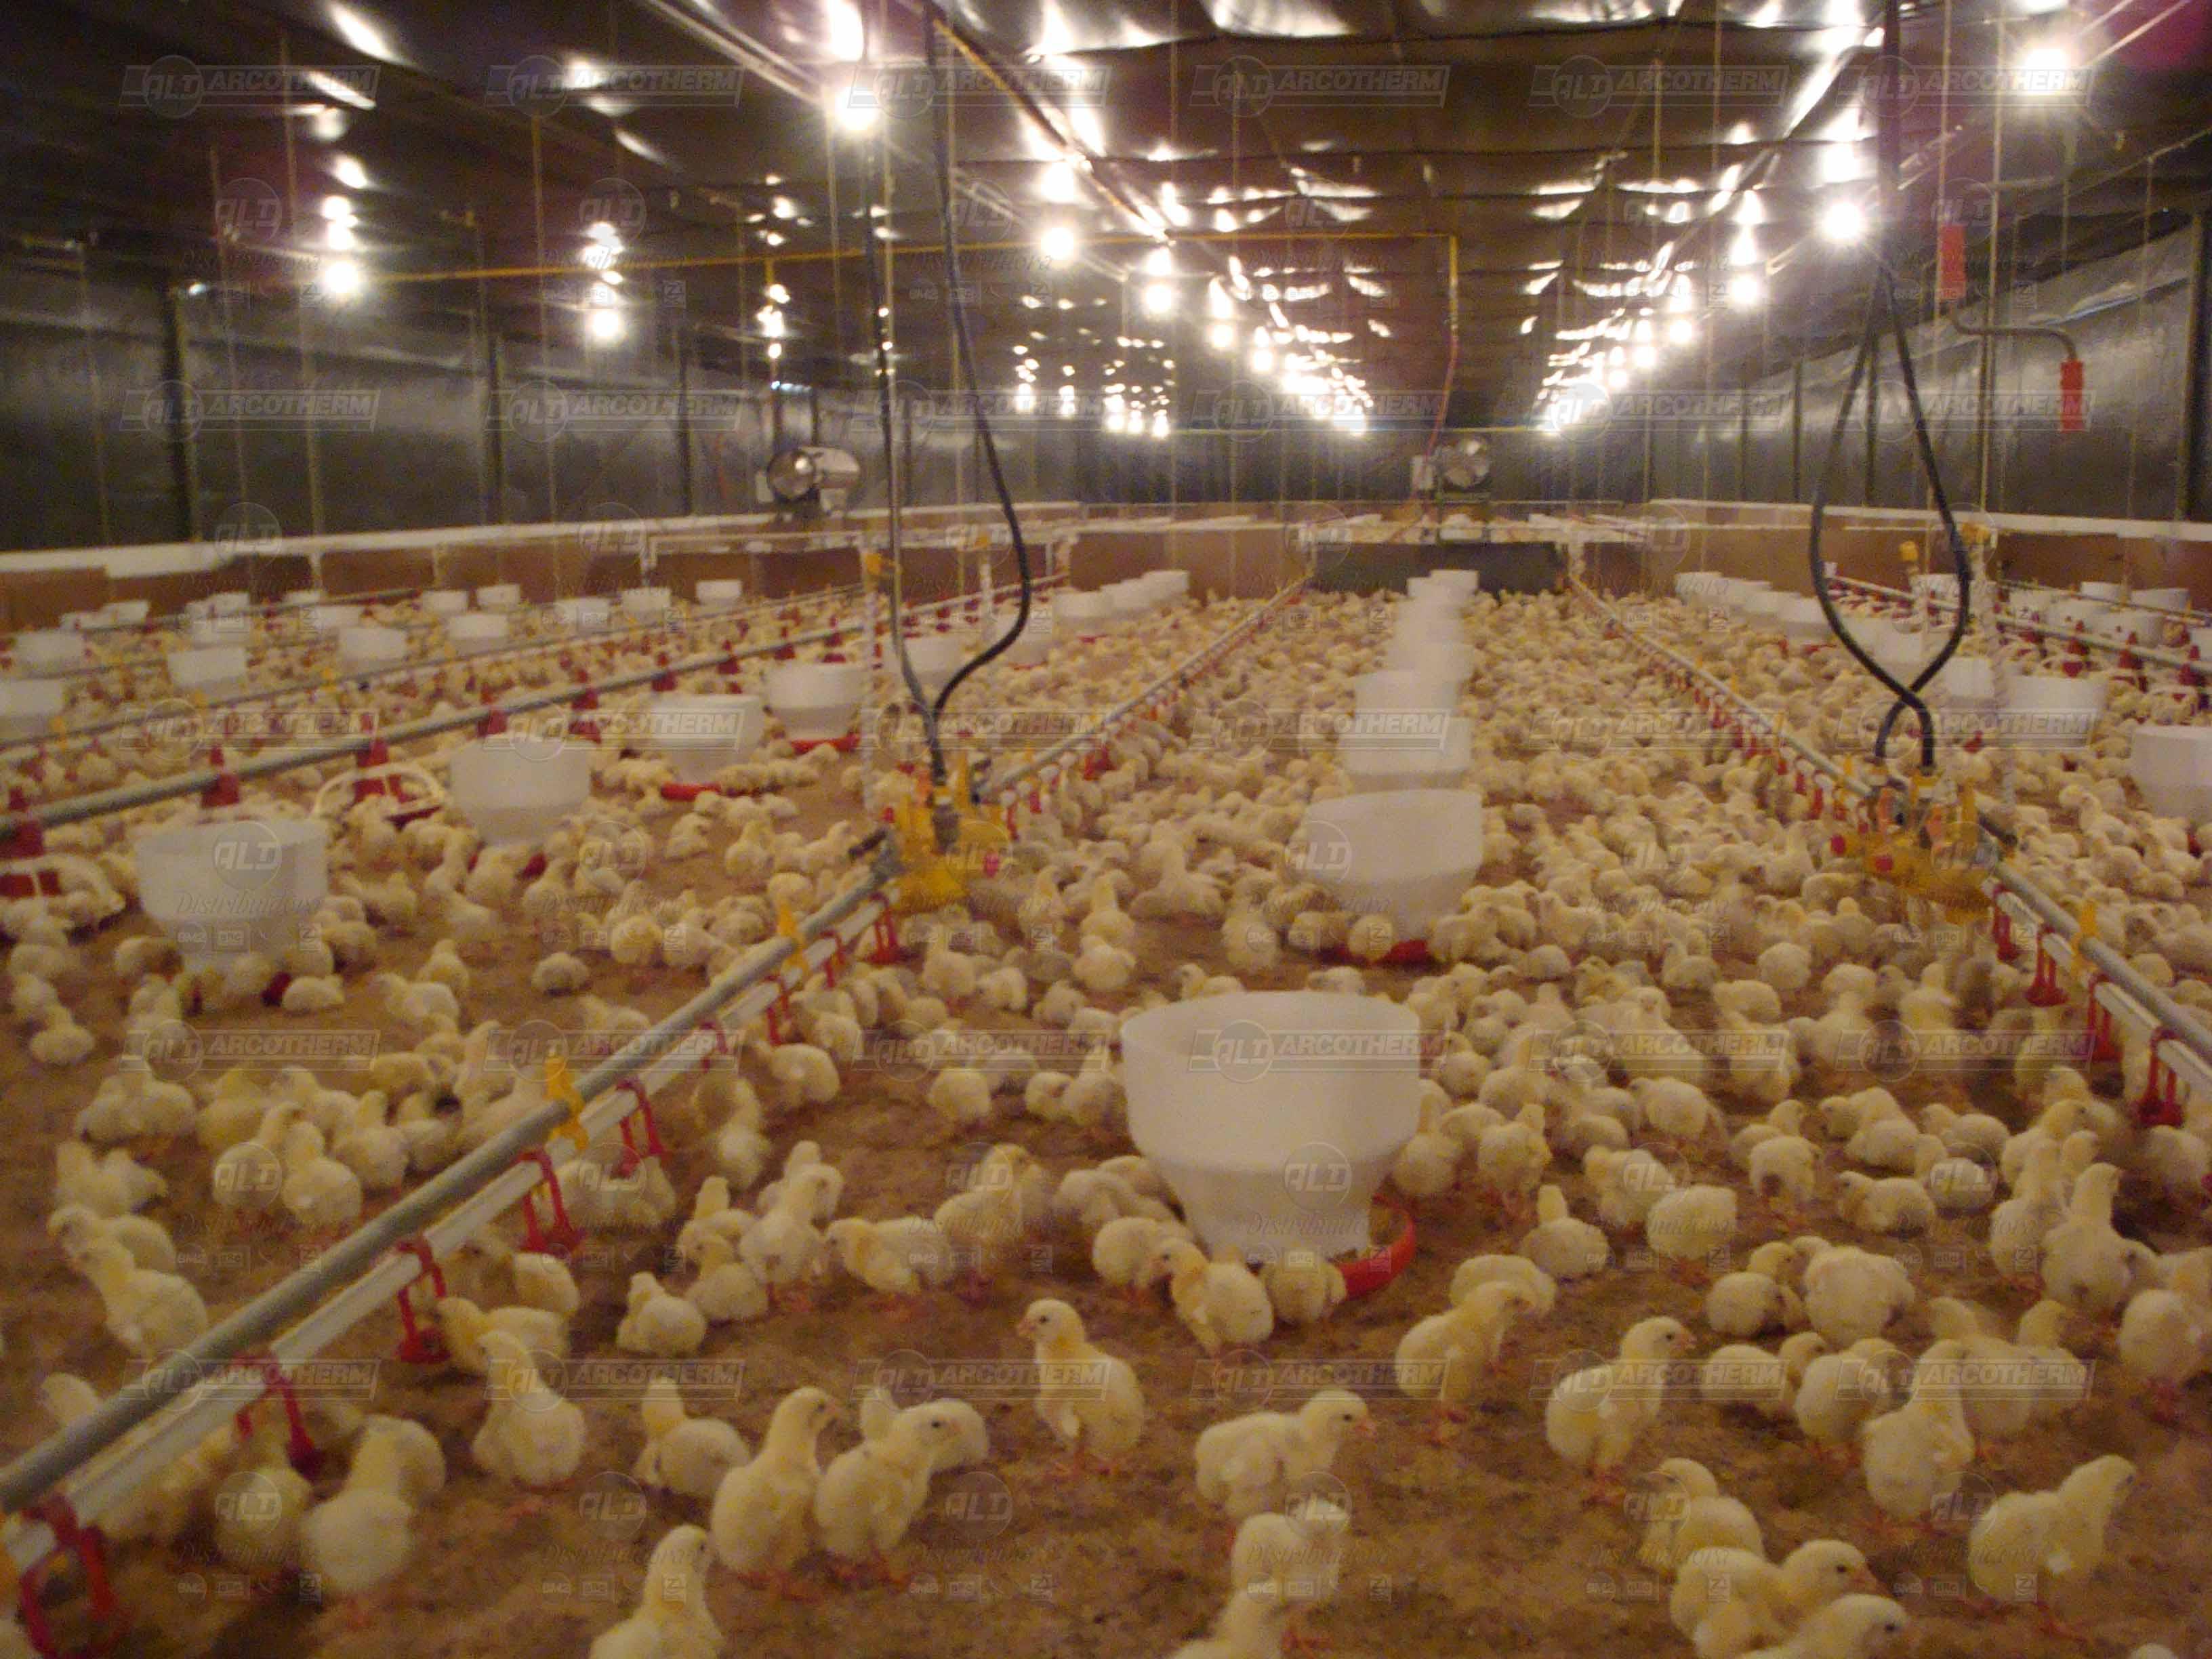 Granja - galpao frango de corte - aquecedor - gerador de ar quente - arcotherm- 9